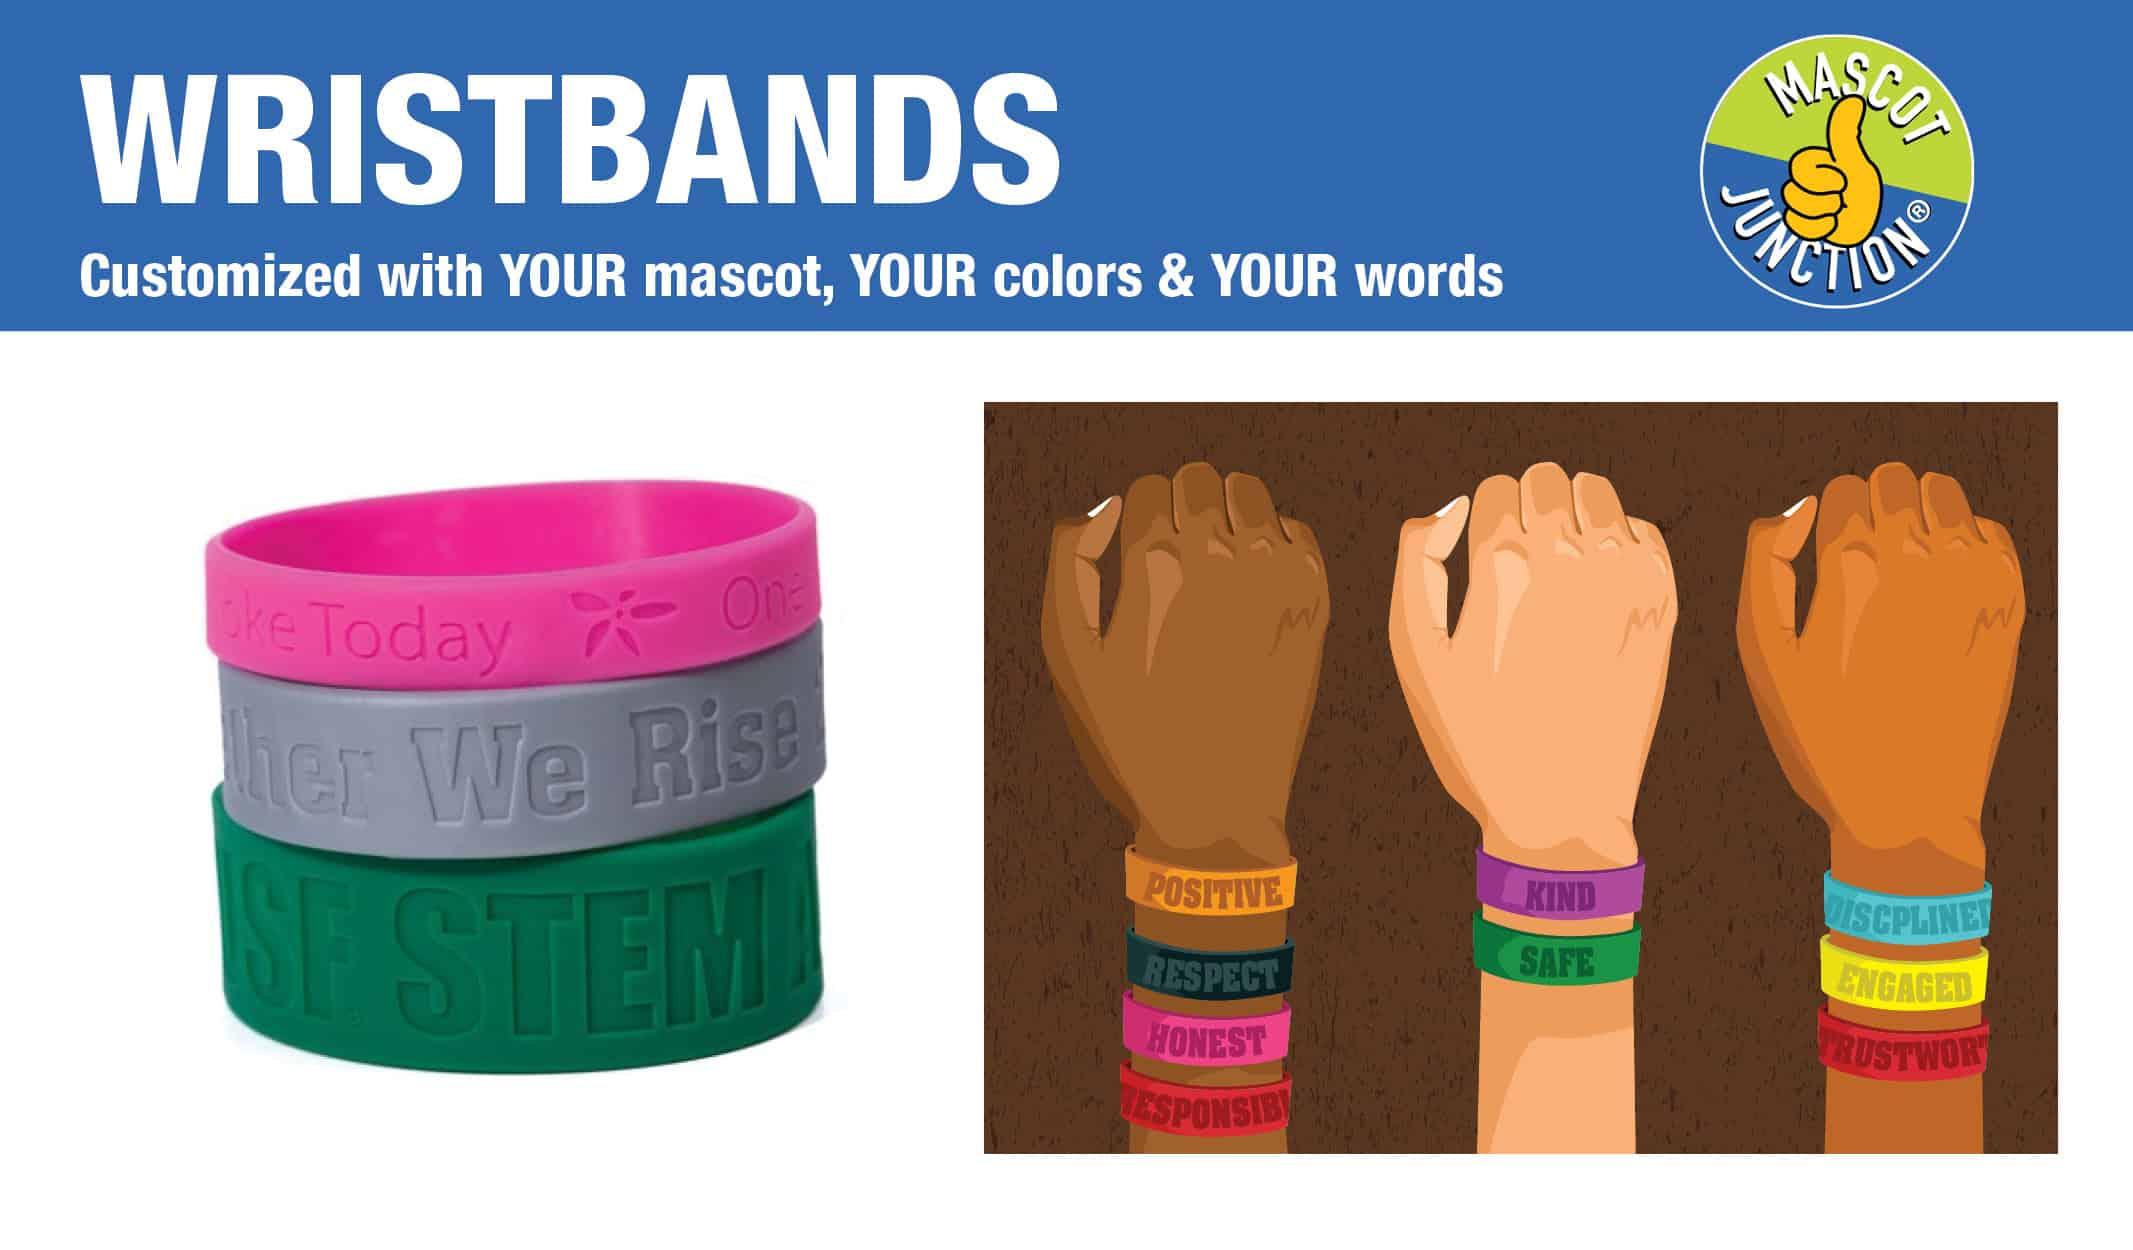 Wristband Web Image